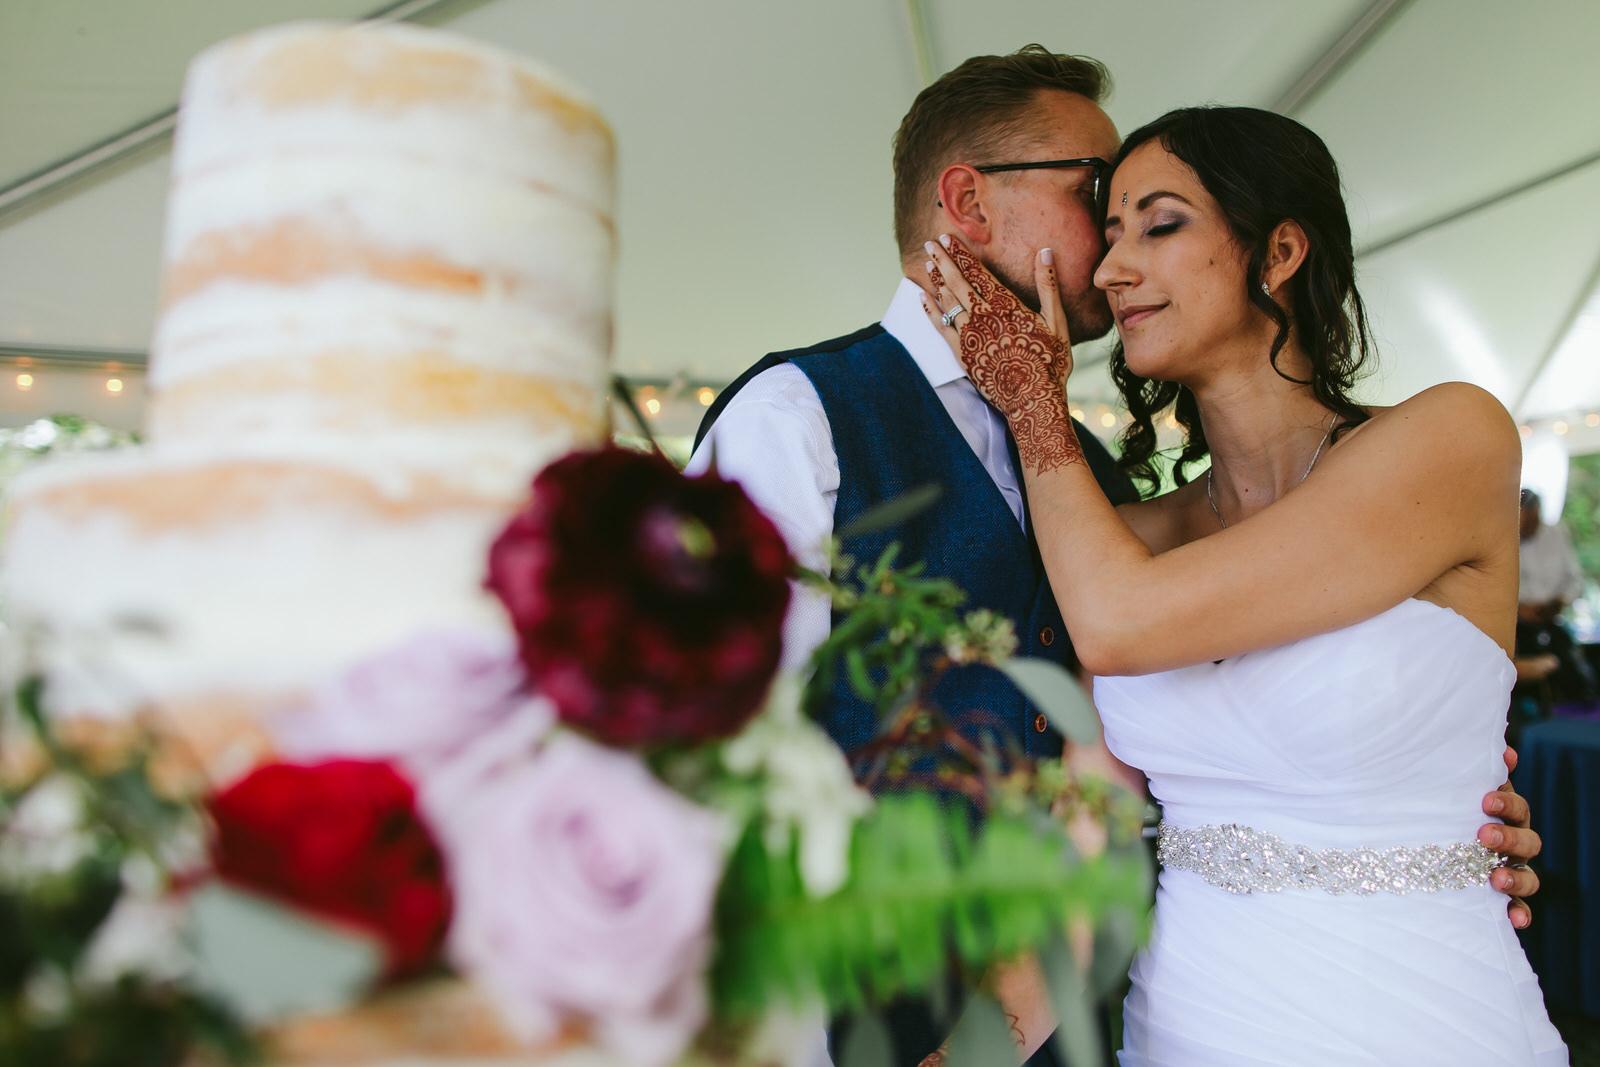 kashi-wedding-reception-tiny-house-photo-bride-groom-cake.jpg